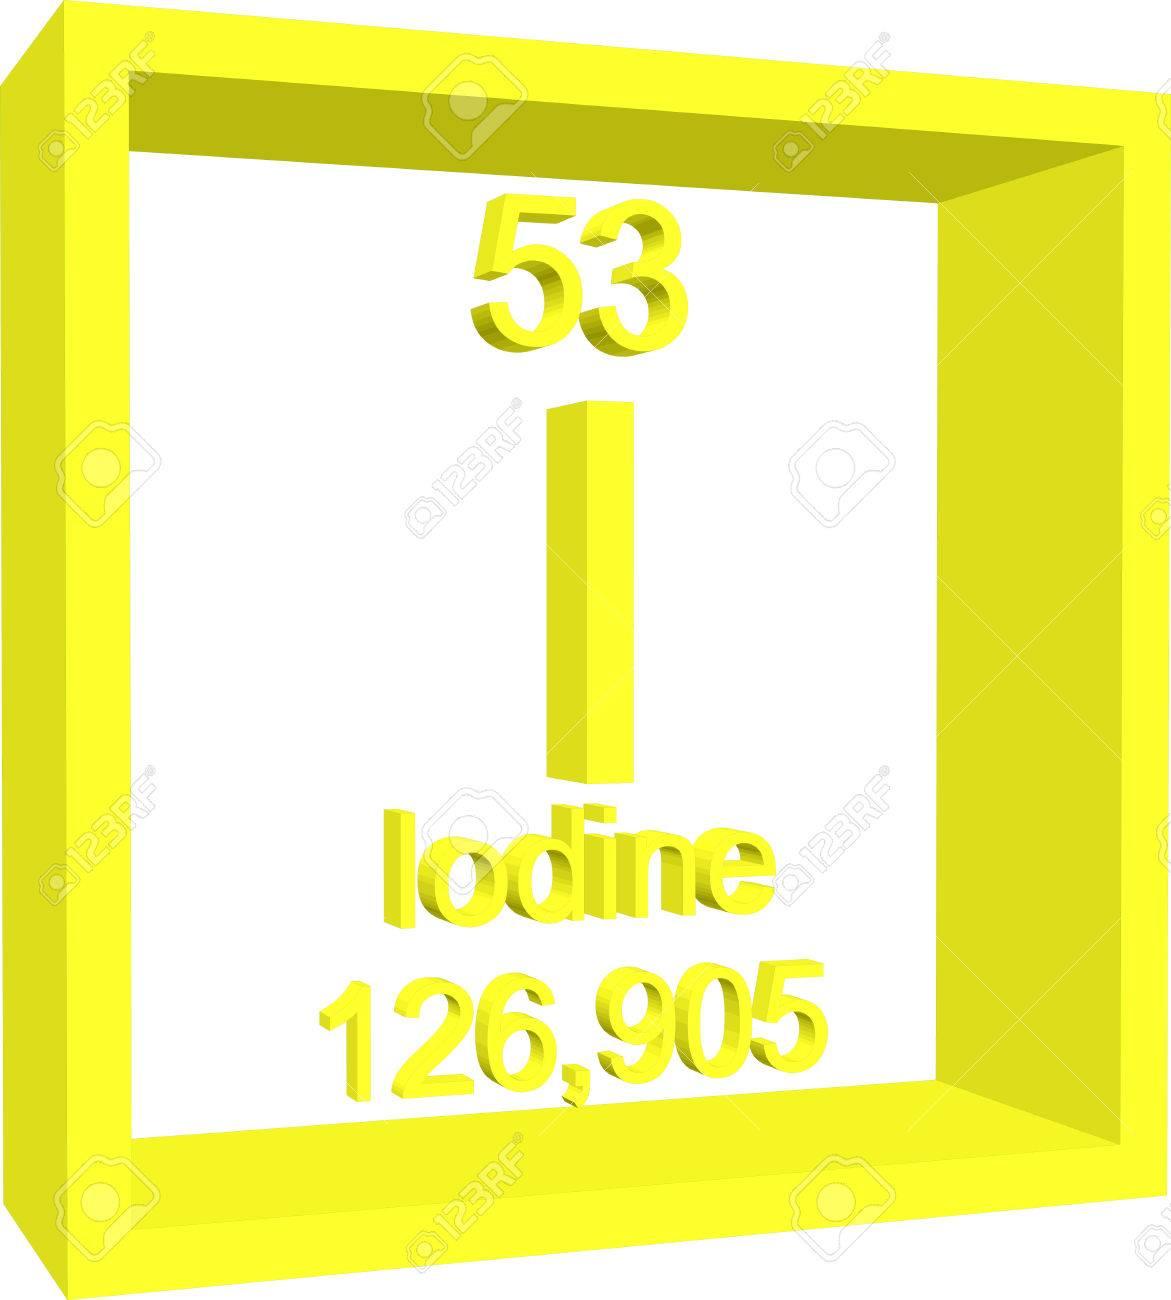 Periodic table of elements iodine royalty free cliparts vectors periodic table of elements iodine stock vector 57971274 urtaz Choice Image